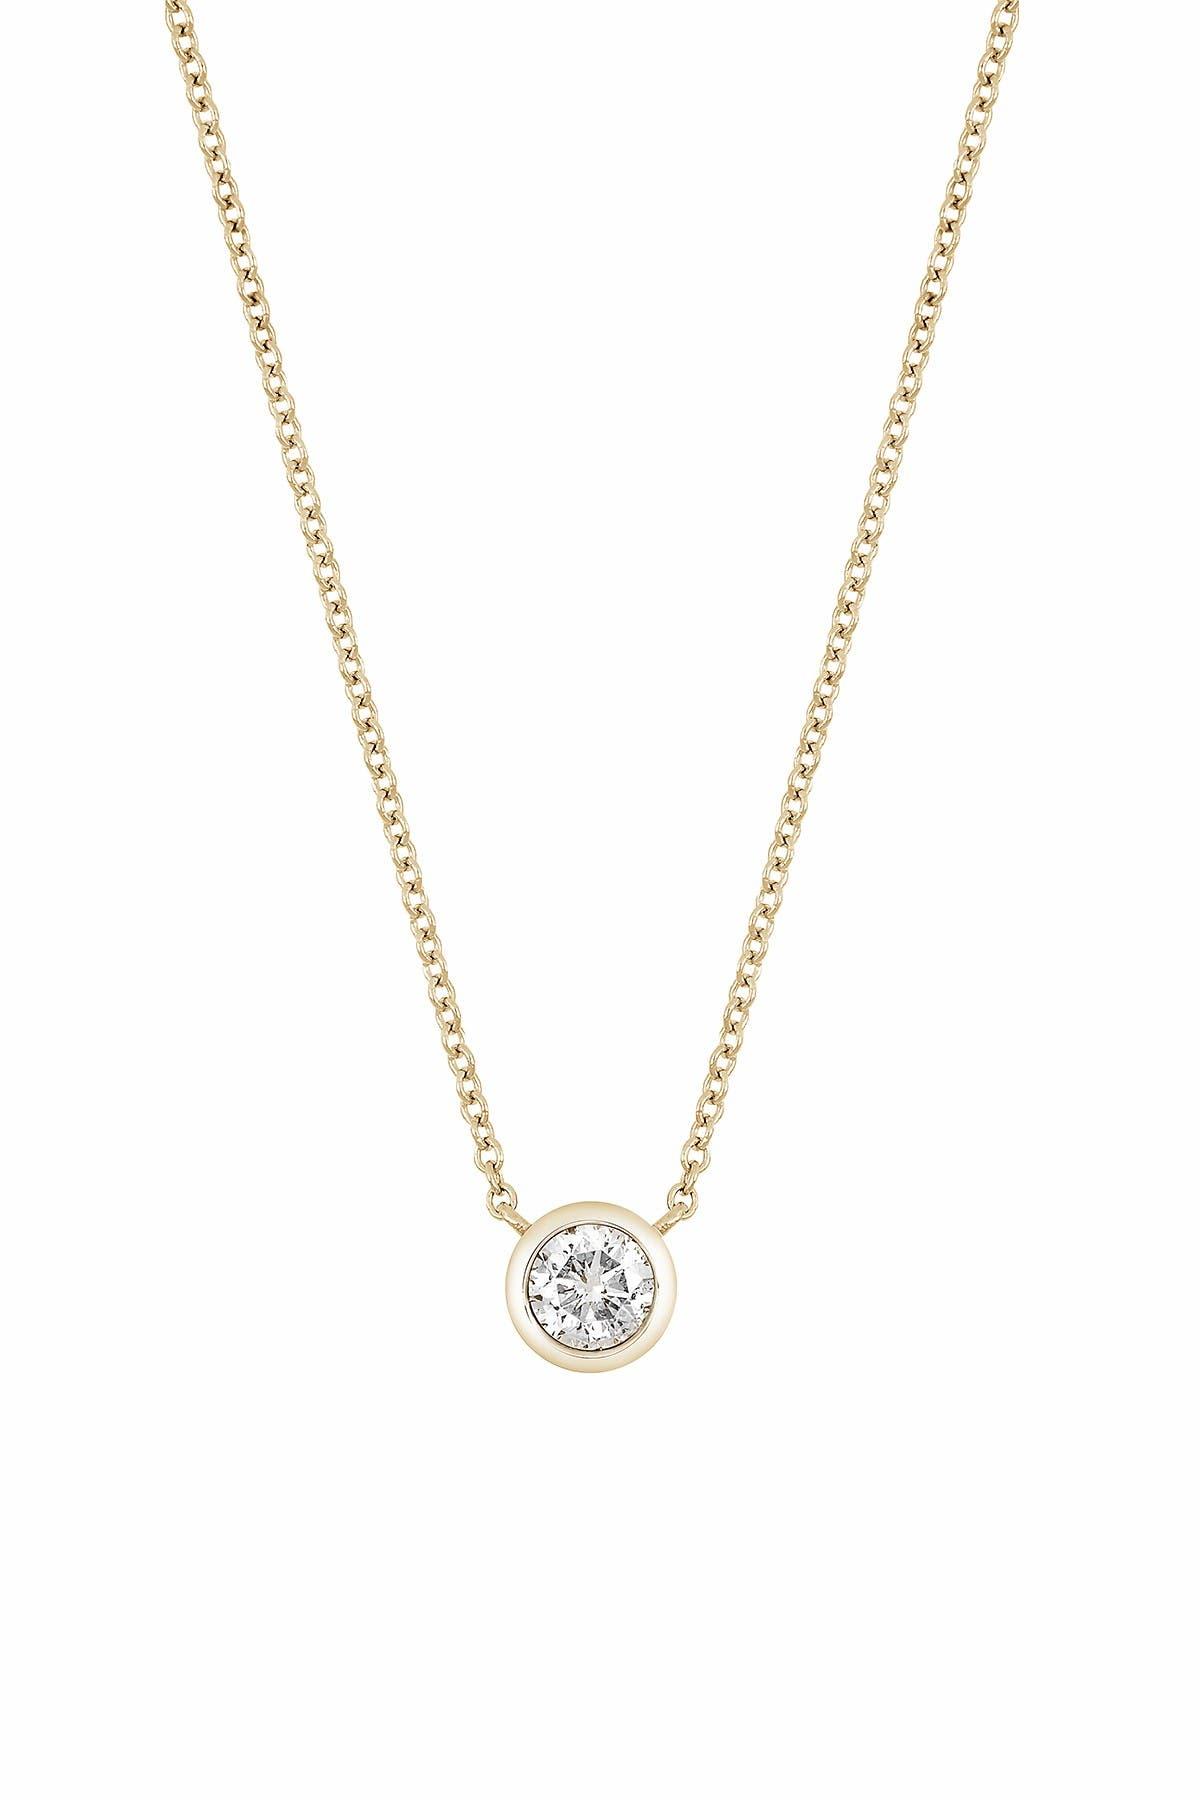 Image of Bony Levy 14K Yellow Gold Bezel Set Diamond Solitaire Pendant Necklace - 0.25 ctw